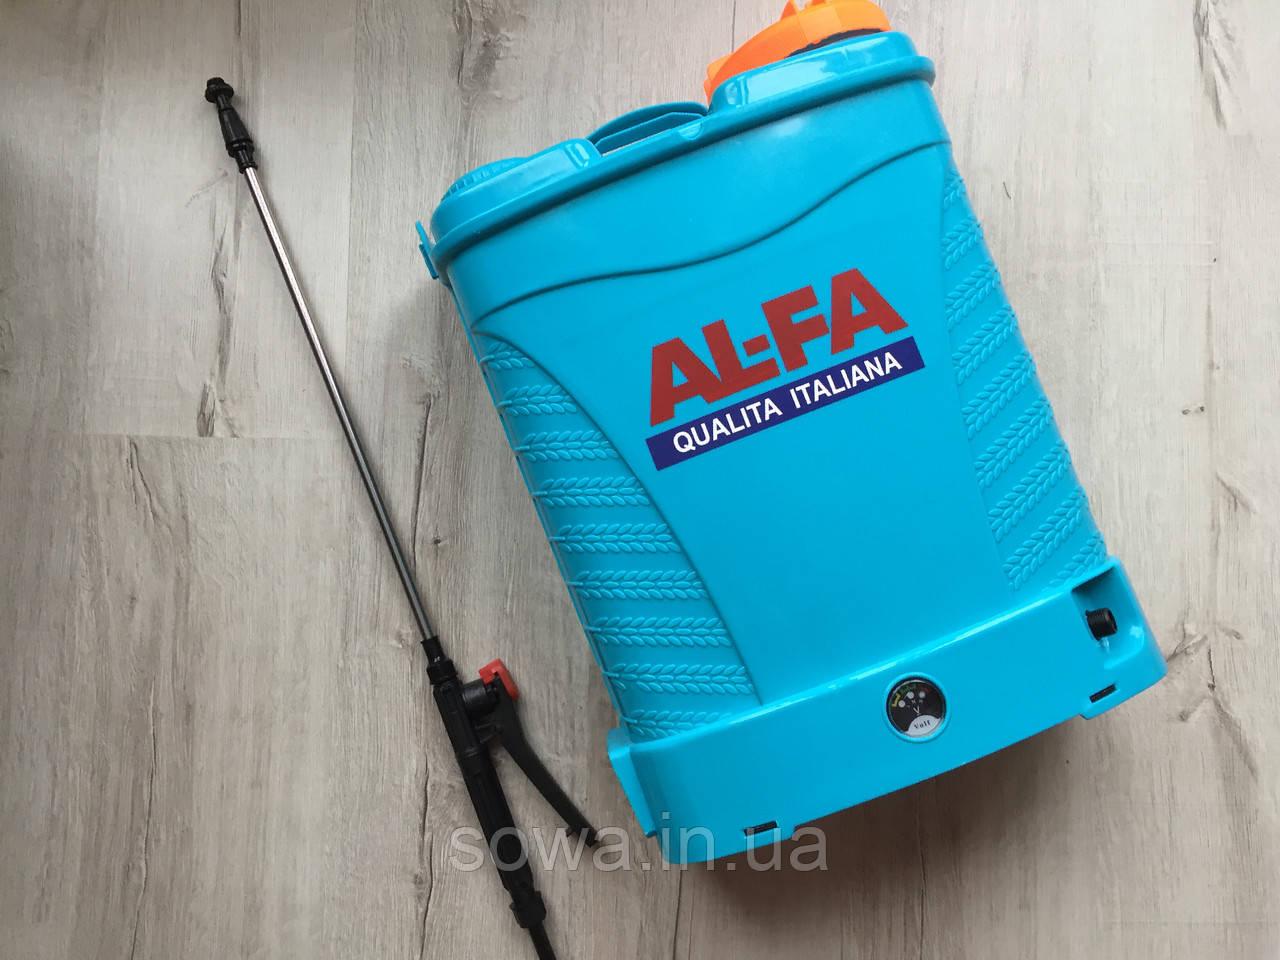 Аккумуляторный опрыскиватель AL-FA Li-ion батарея : 16L, 12A.h